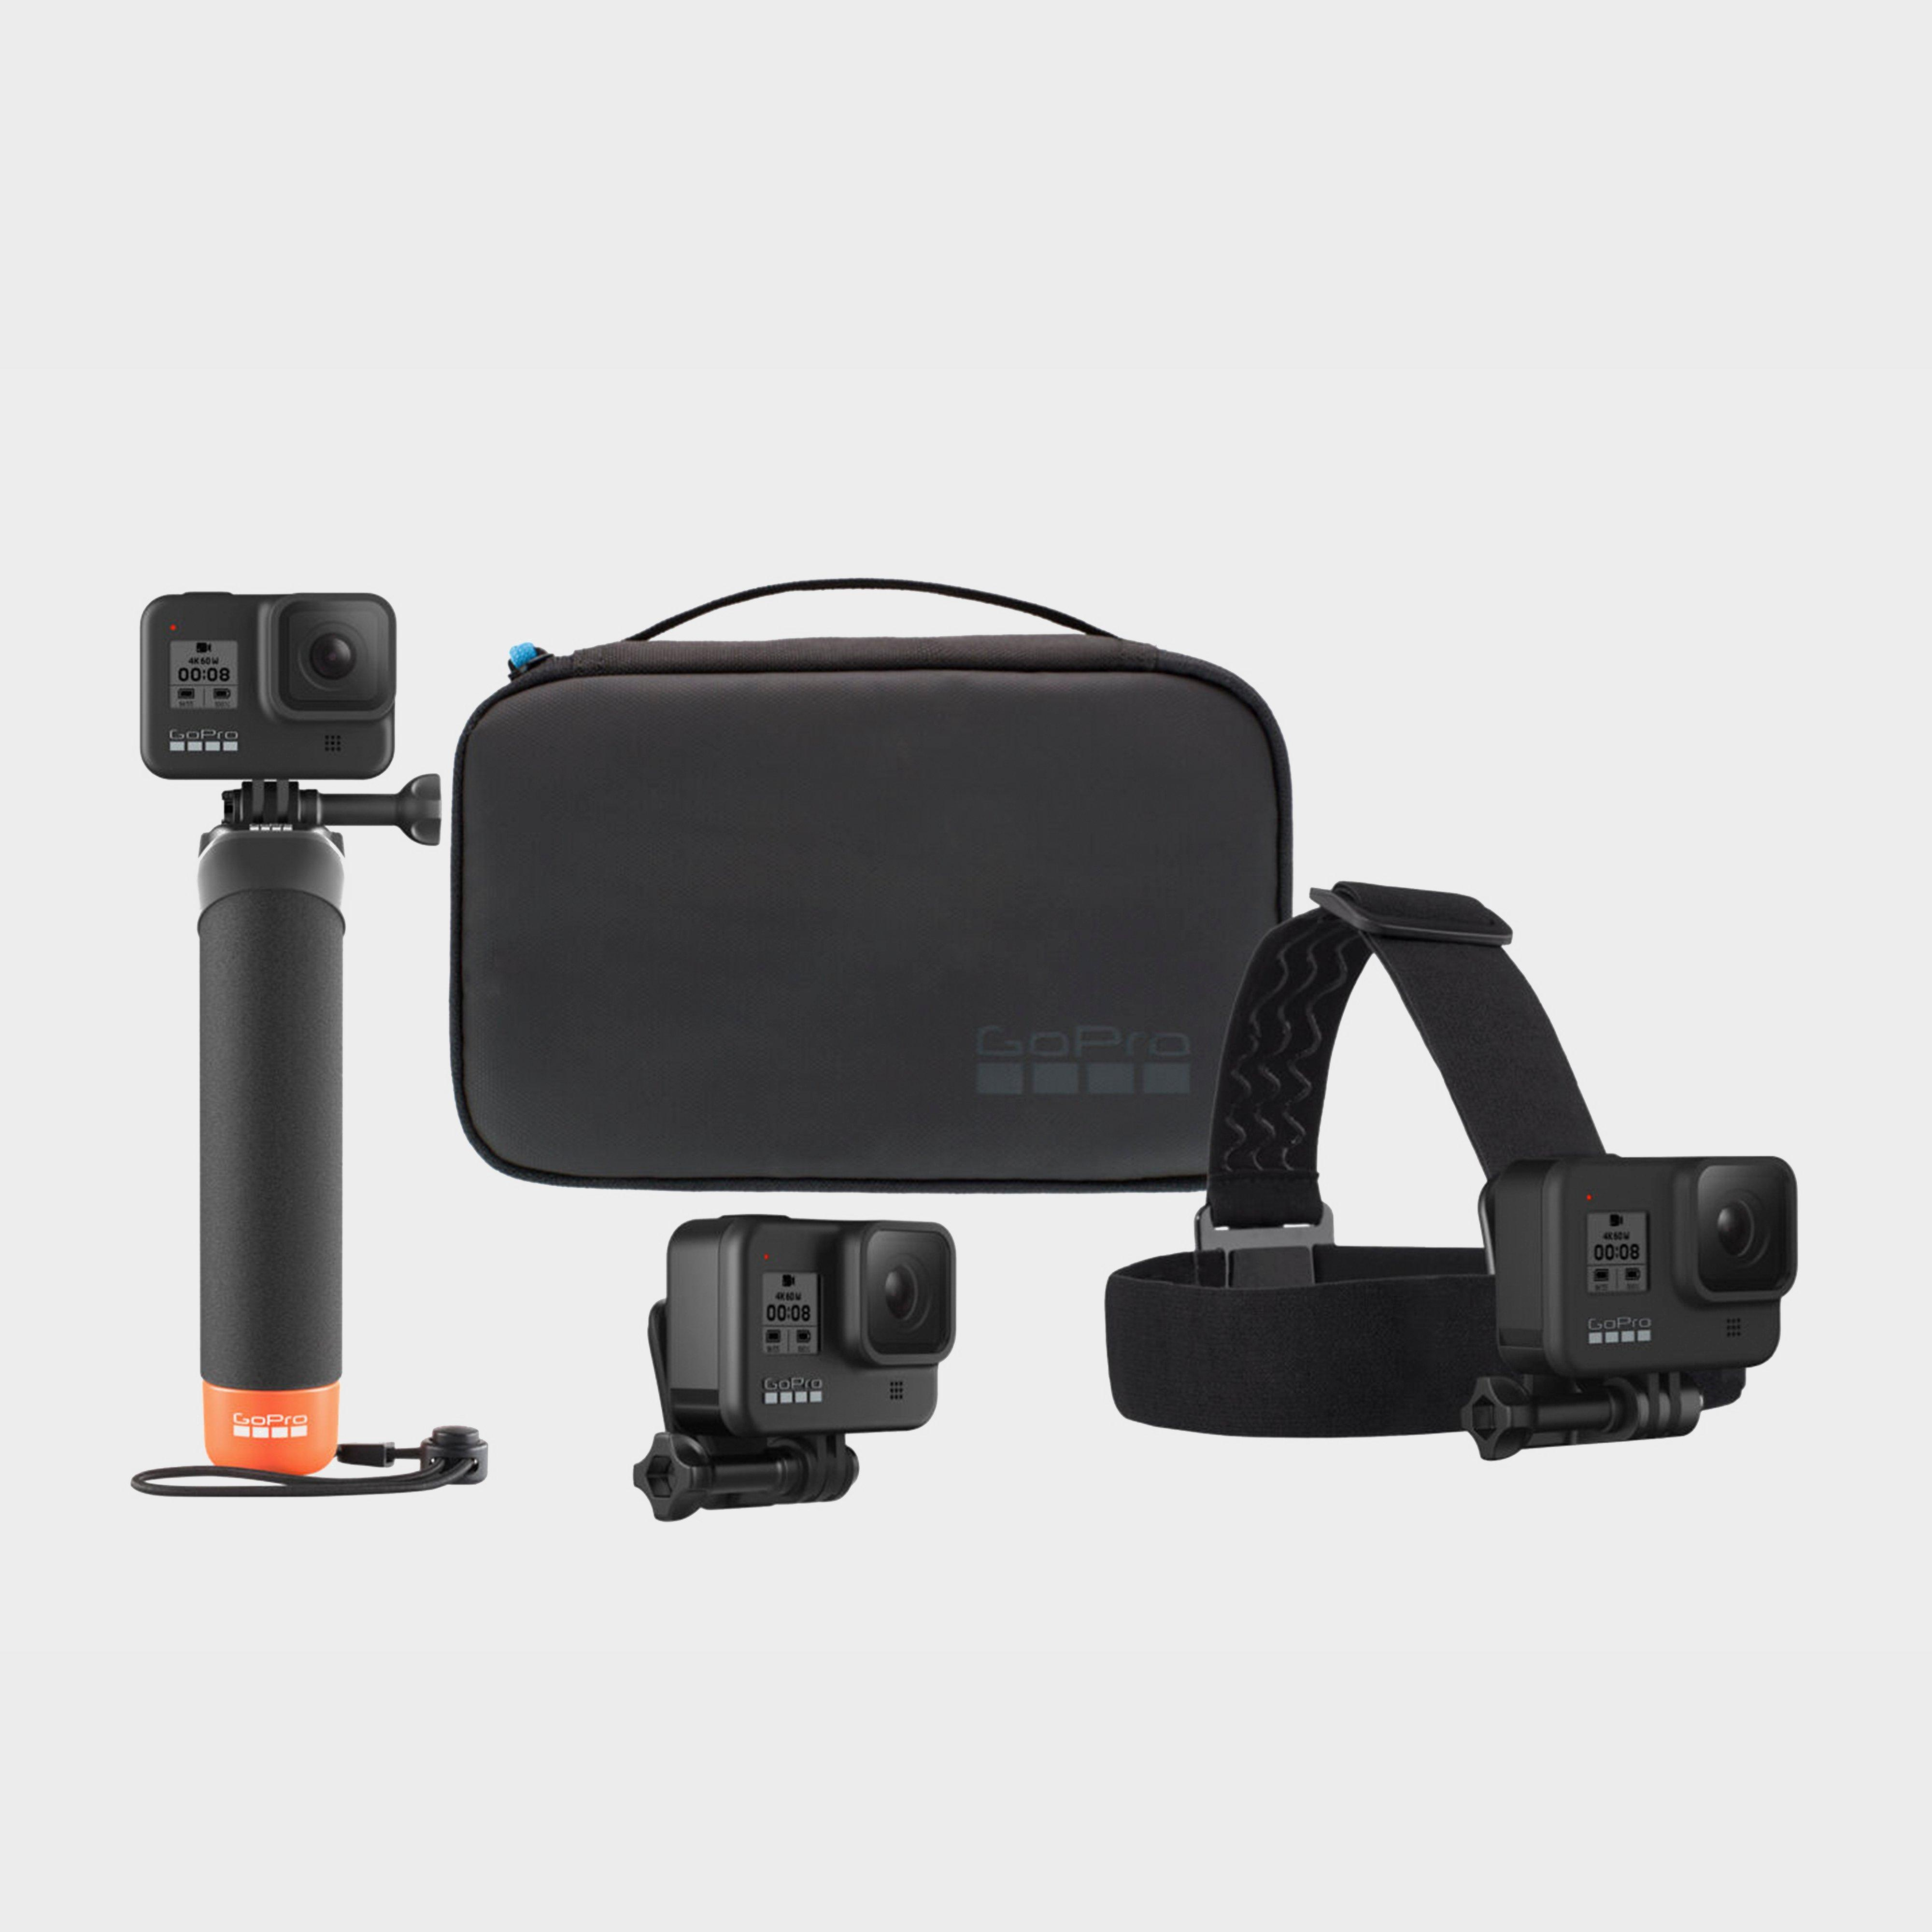 Gopro Gopro Adventure Accessory Kit, Black